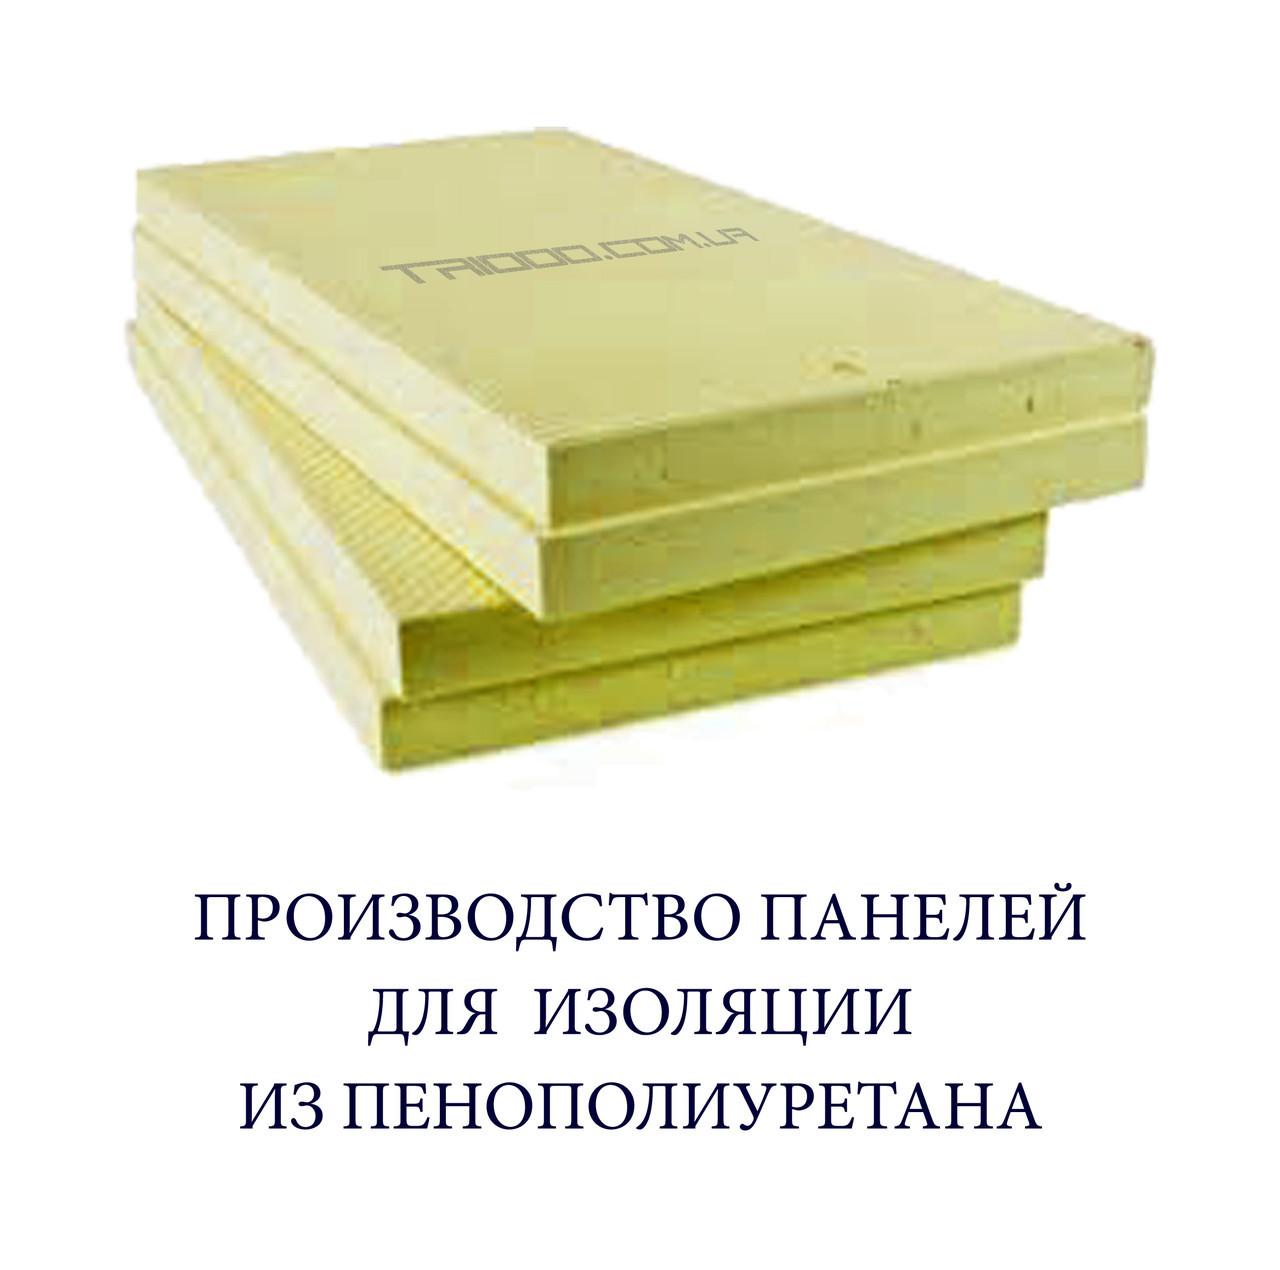 Плита пенополиуретановая (панель ППУ) 900 х 600 х 80 мм